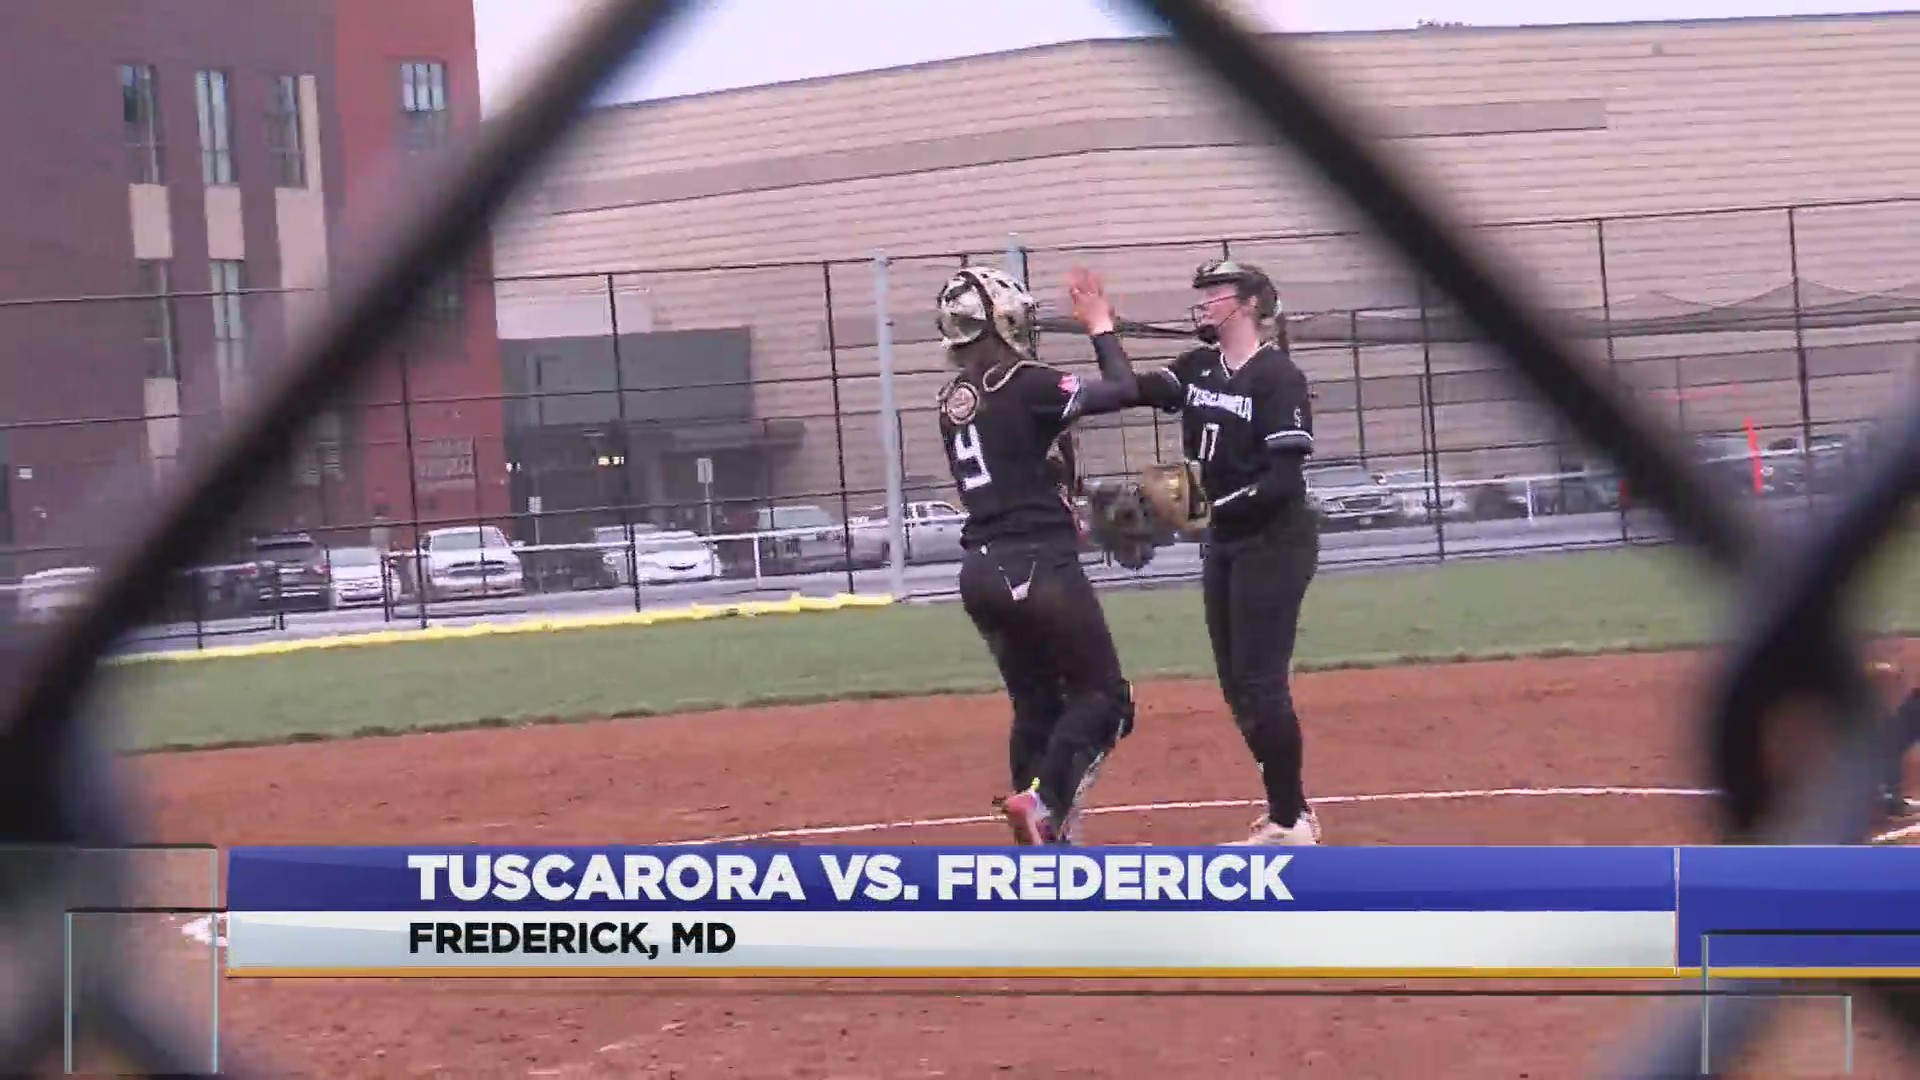 Tuscarora_vs__Frederick_Softball_0_20190330041222